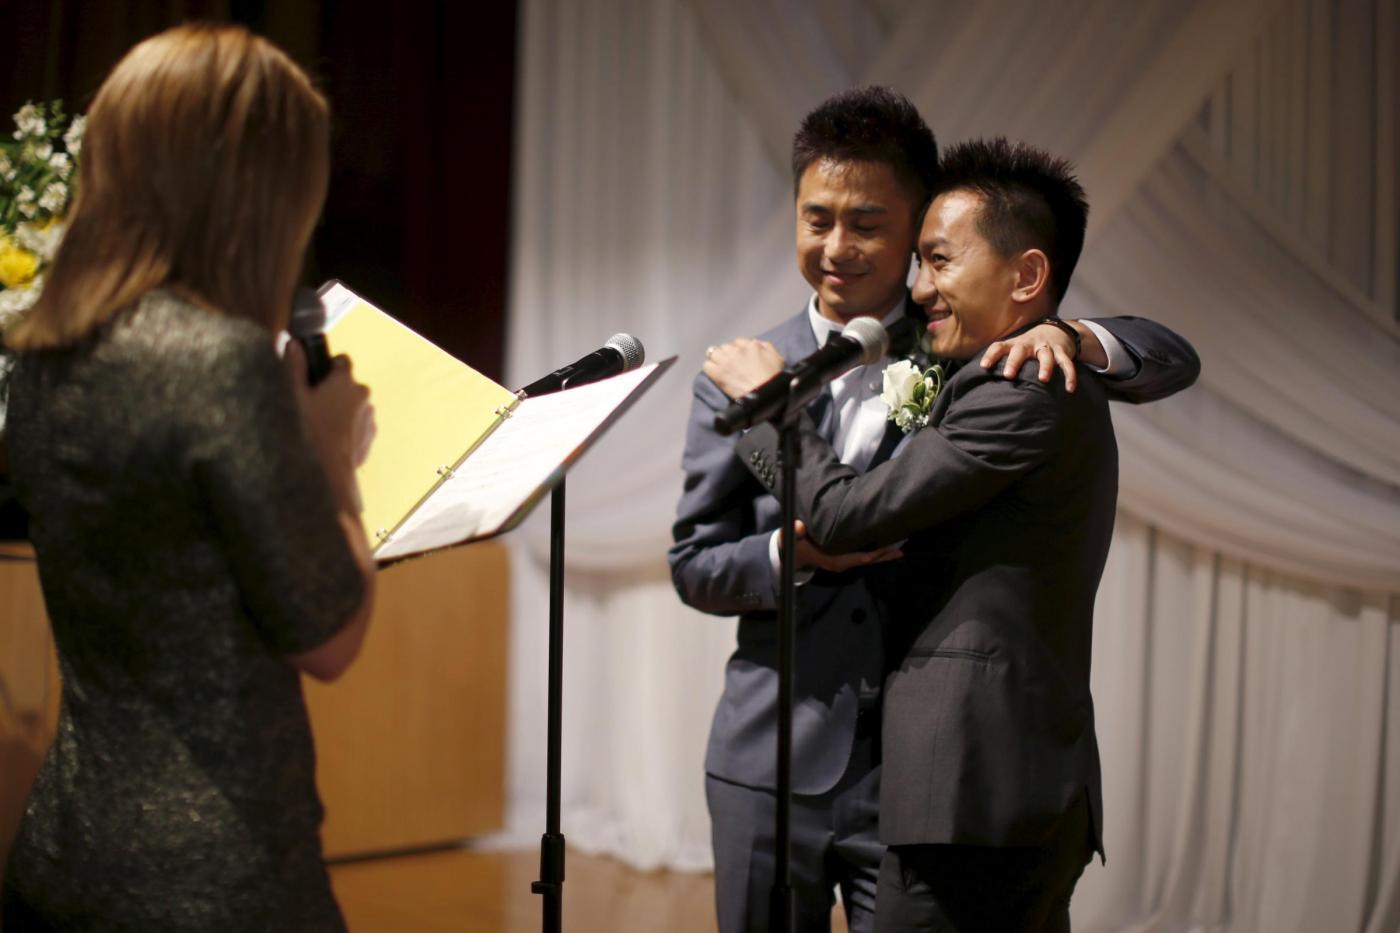 Sette coppie omosessuali cinesi si sposano a Los Angeles13